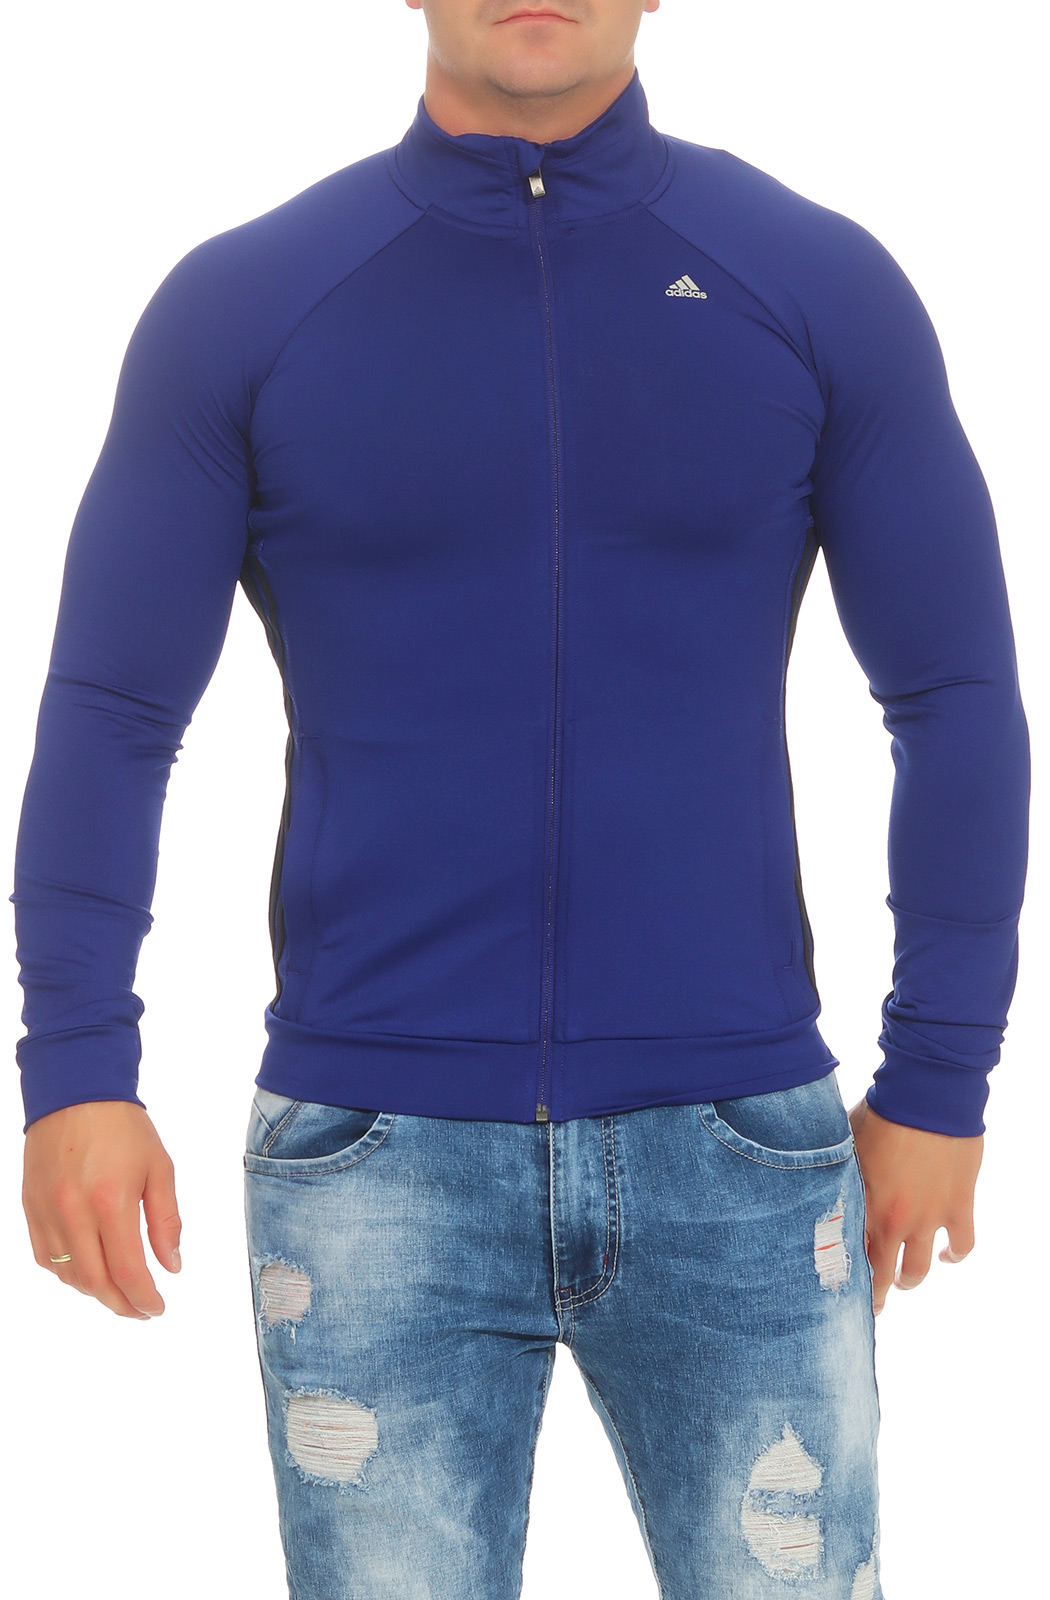 Adidas Herren 3S ESS Warm Up Trainingsjacke Sport Jacke